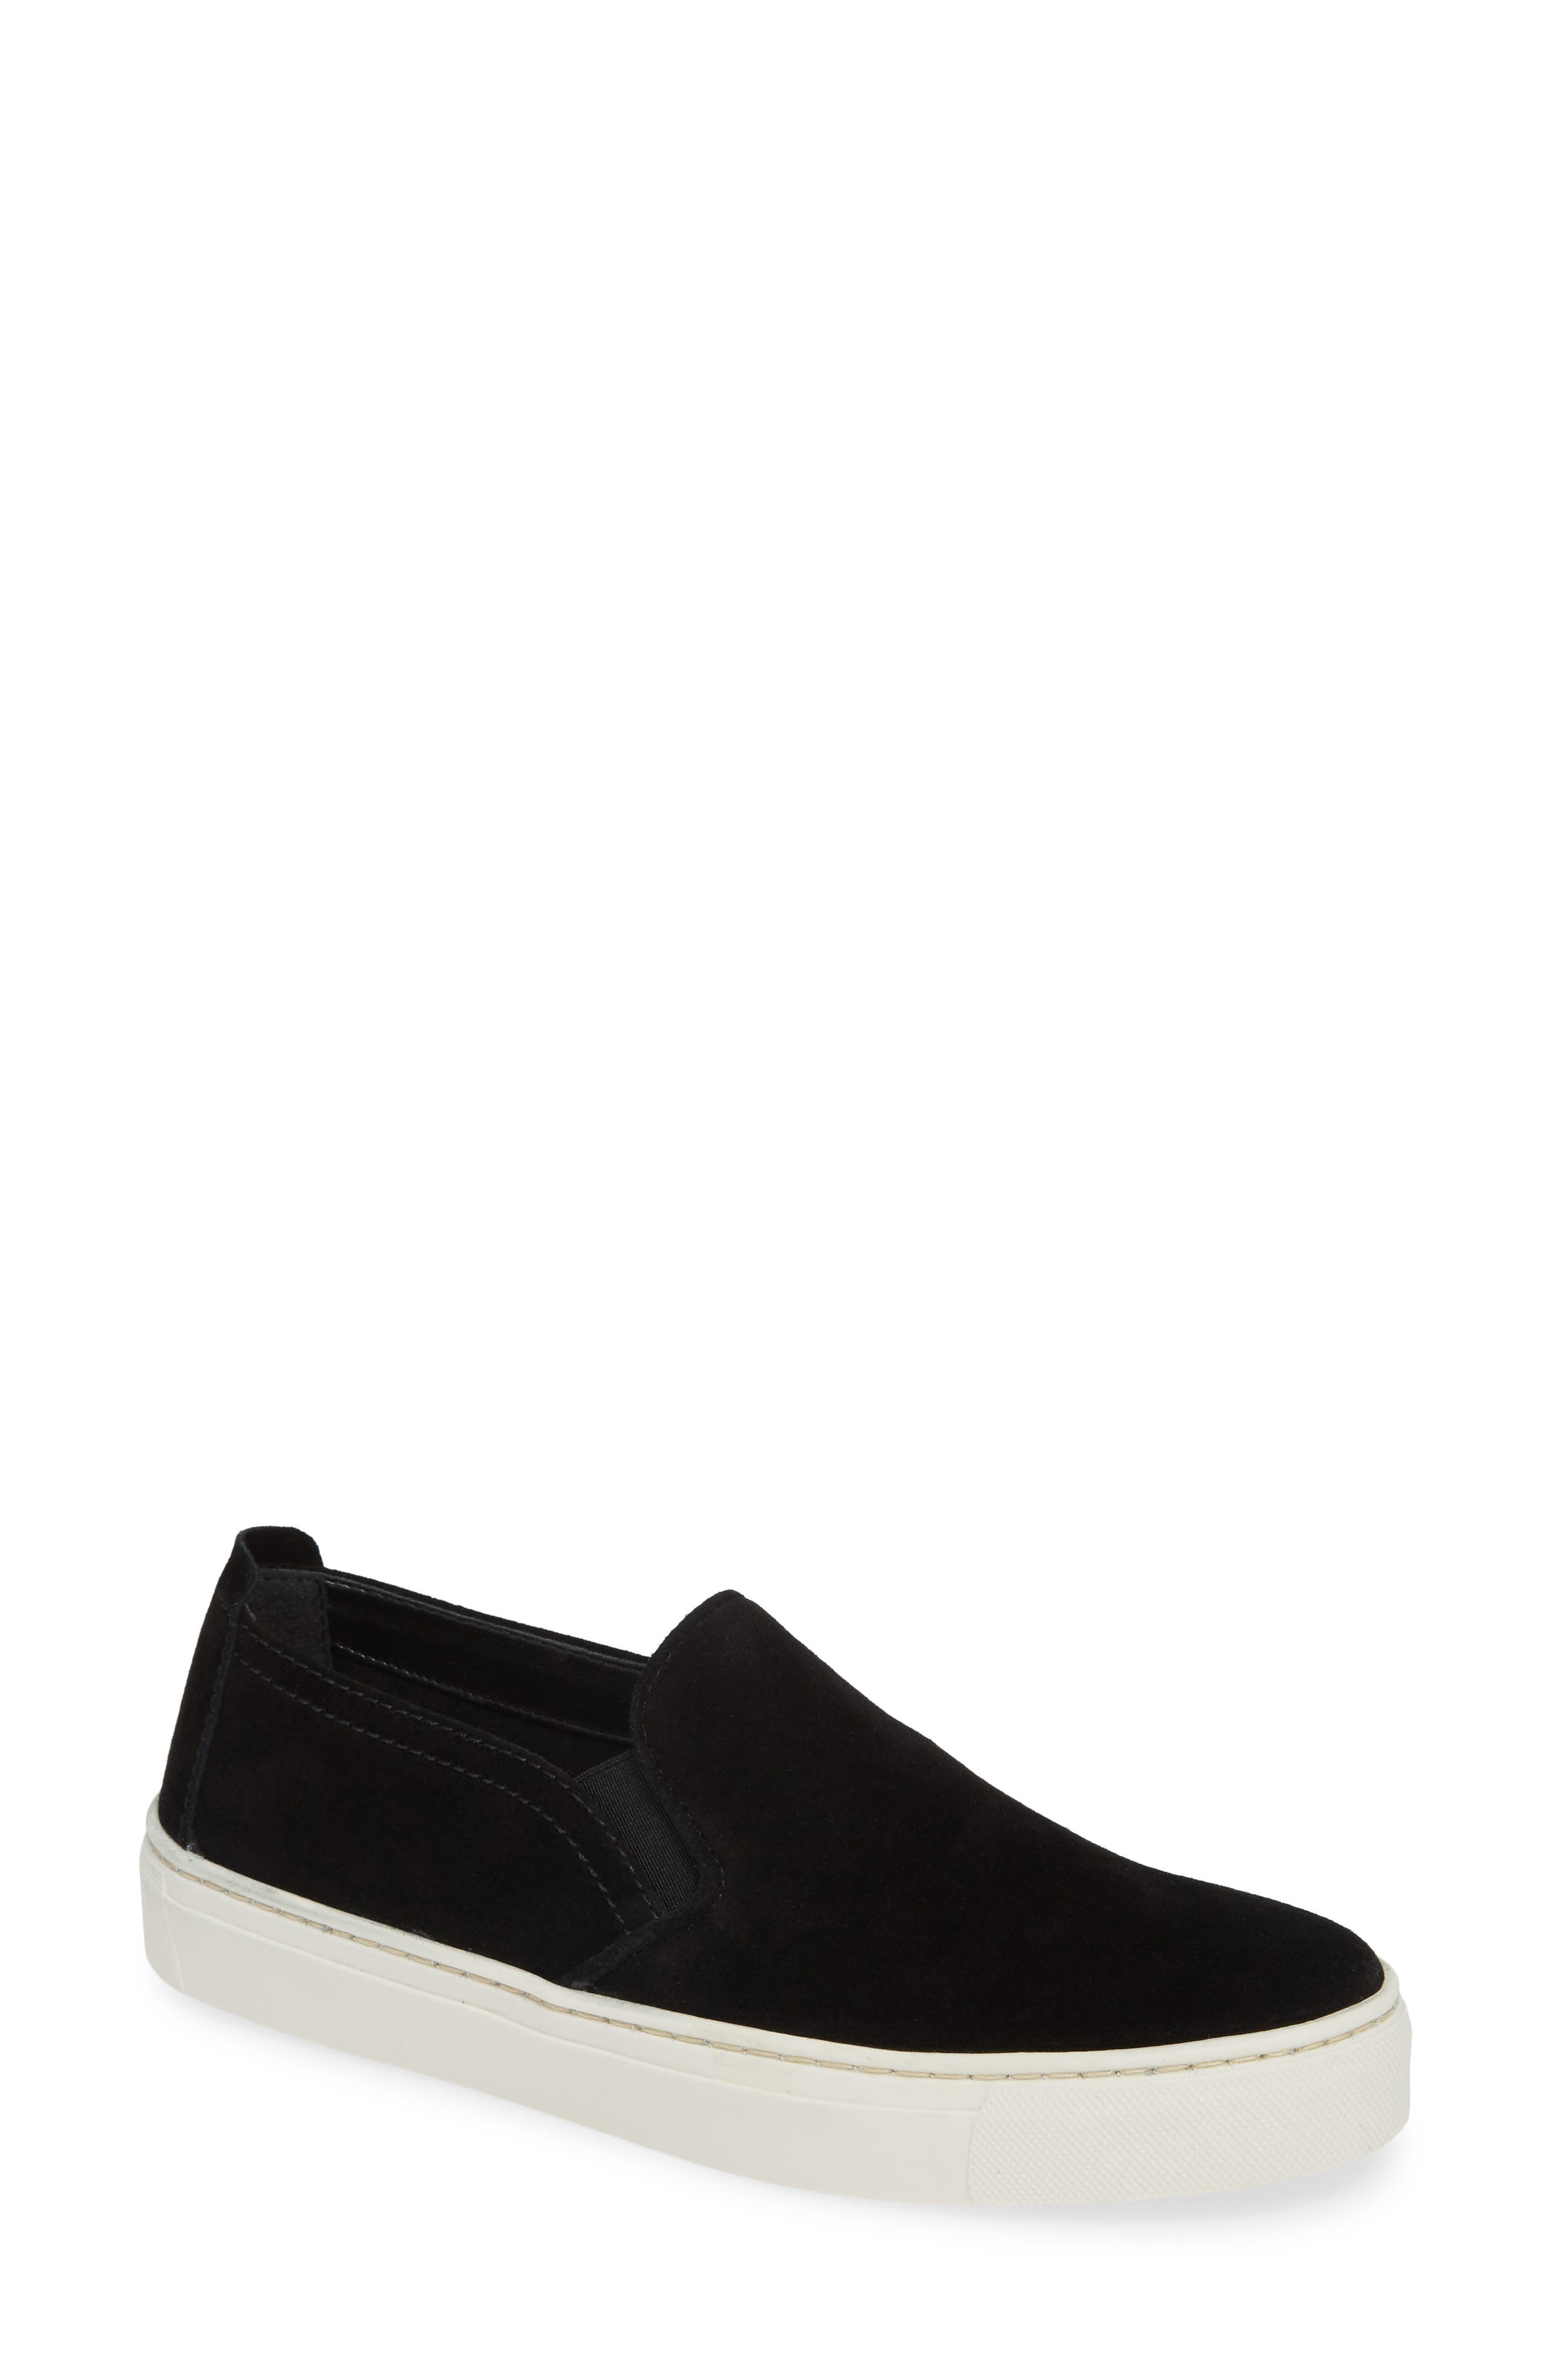 'Sneak Name' Sneaker,                             Main thumbnail 1, color,                             BLACK WATERPROOF SUEDE